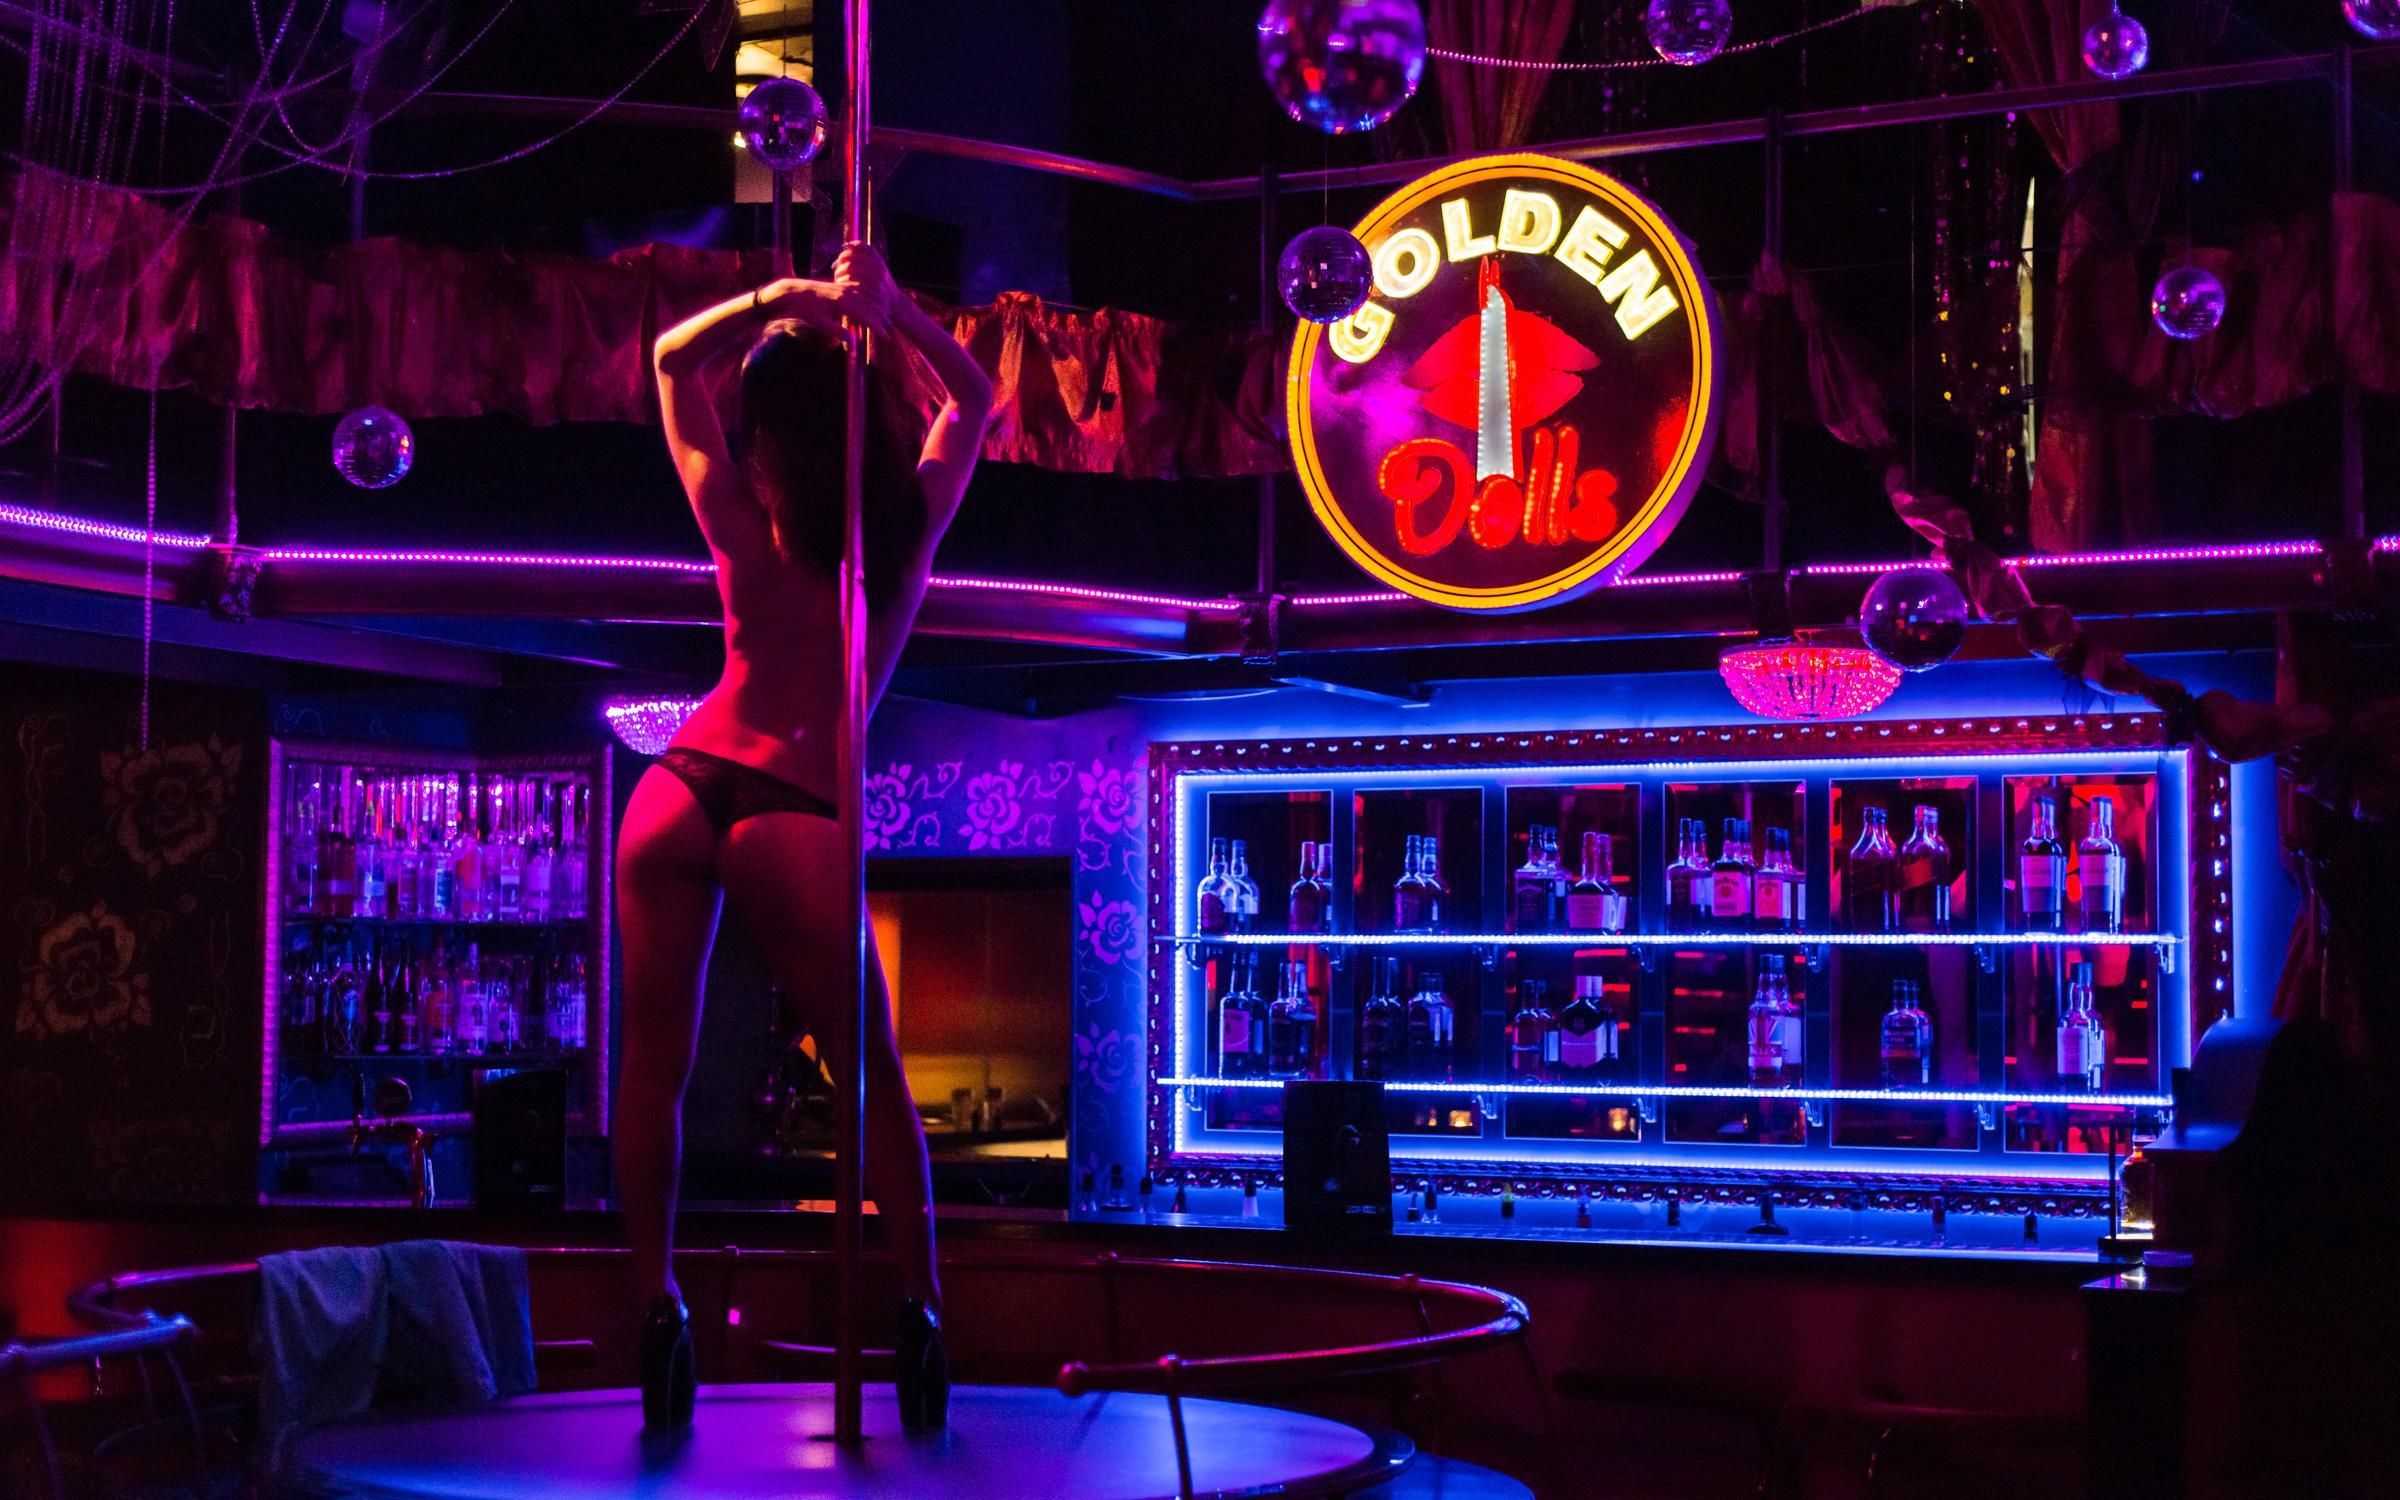 fotografii-klubi-golie